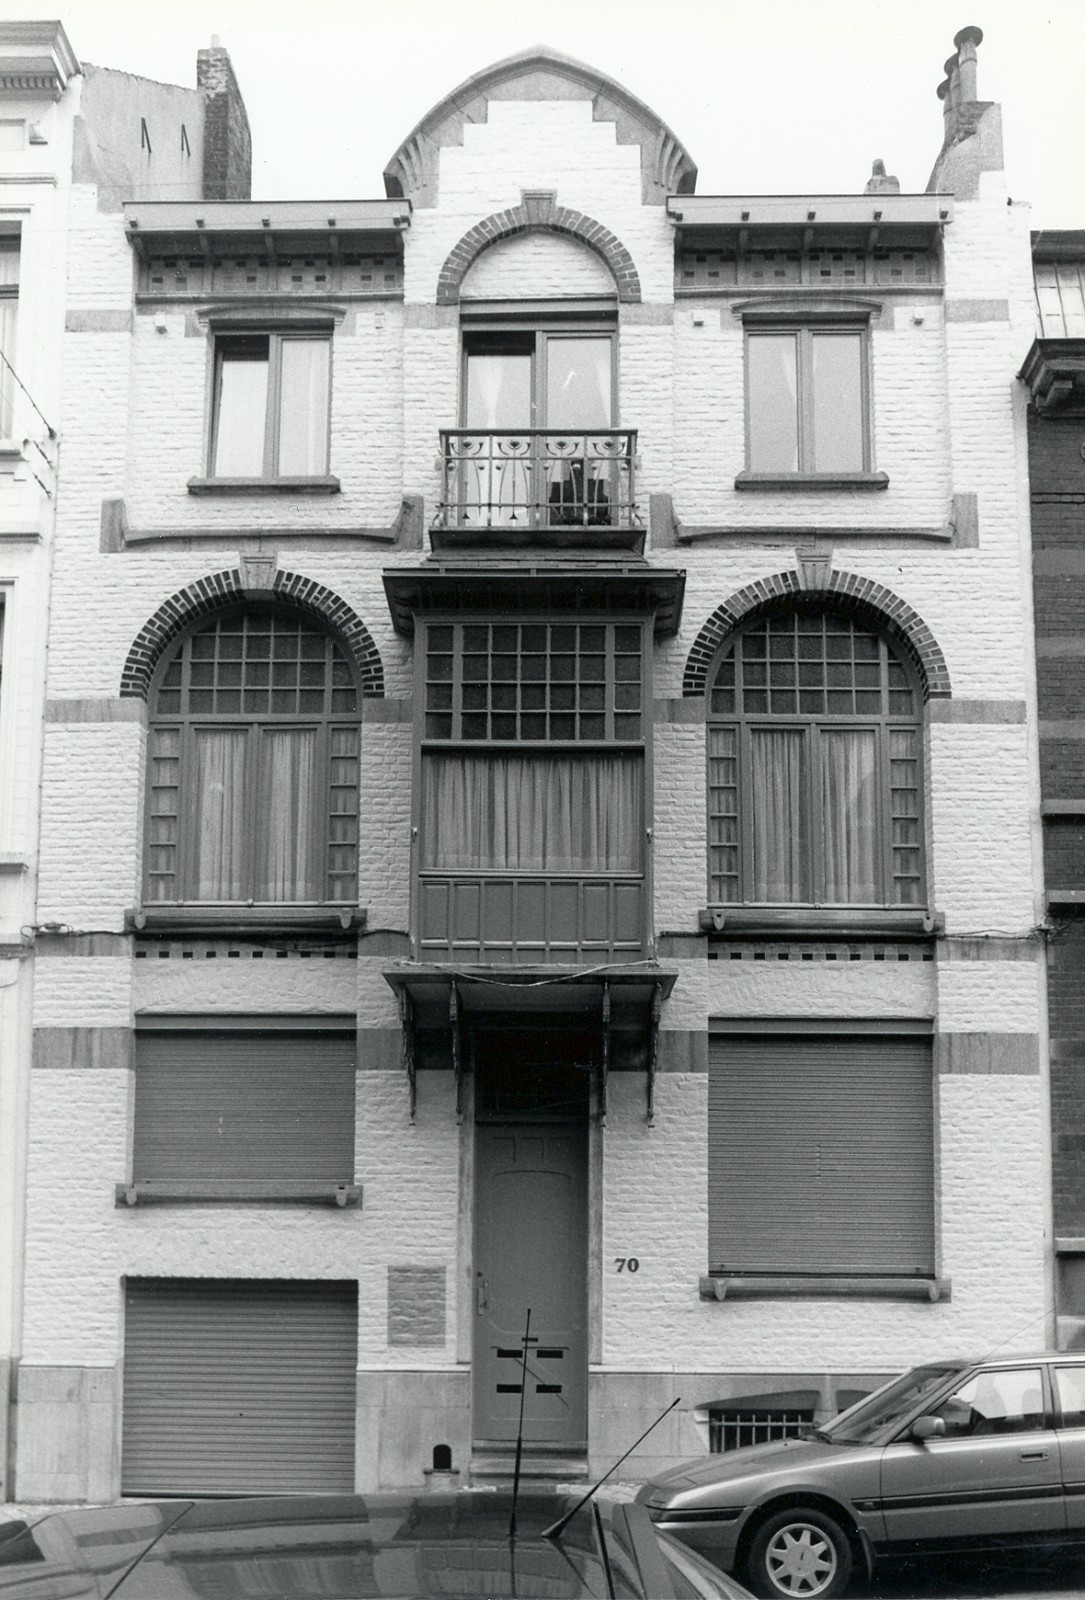 Rue d'Irlande 70 (Sint-Lukasarchief Brussel, s.d.).